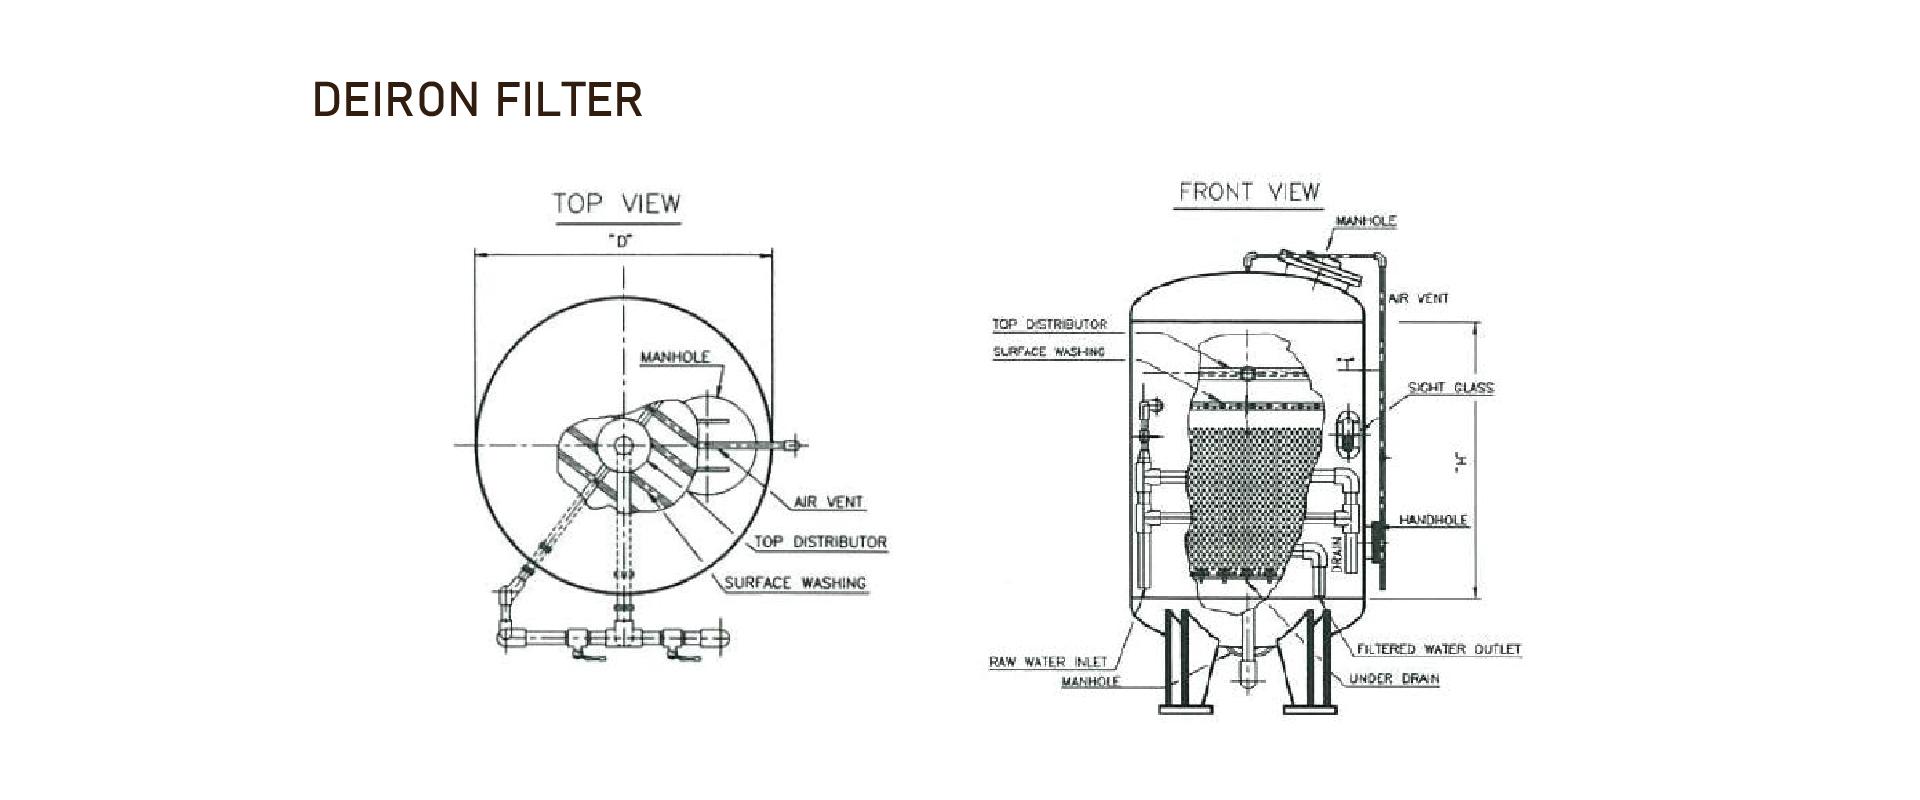 De-ion filter- เพื่อล้างออกซิไดและไอออน